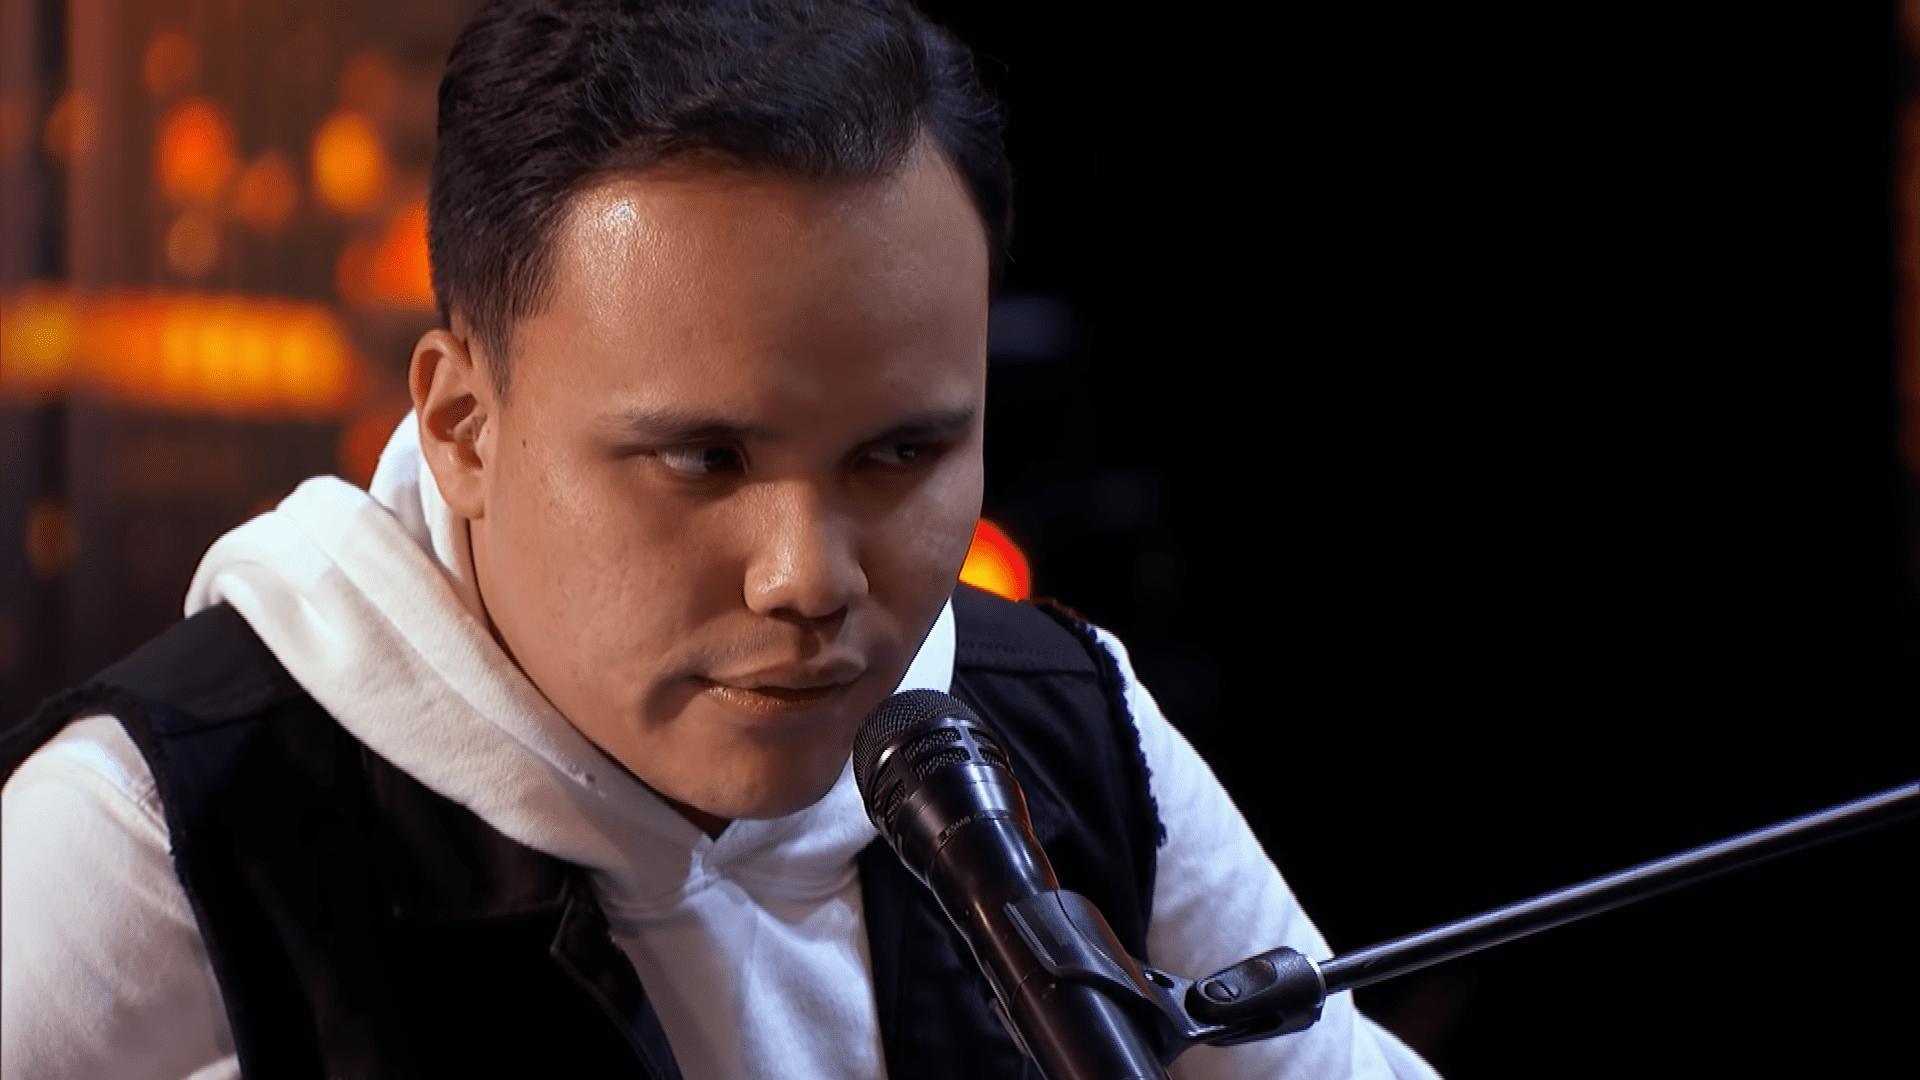 Kodi cantando en tarima │Imagen tomada de: YouTube / America's Got Talent